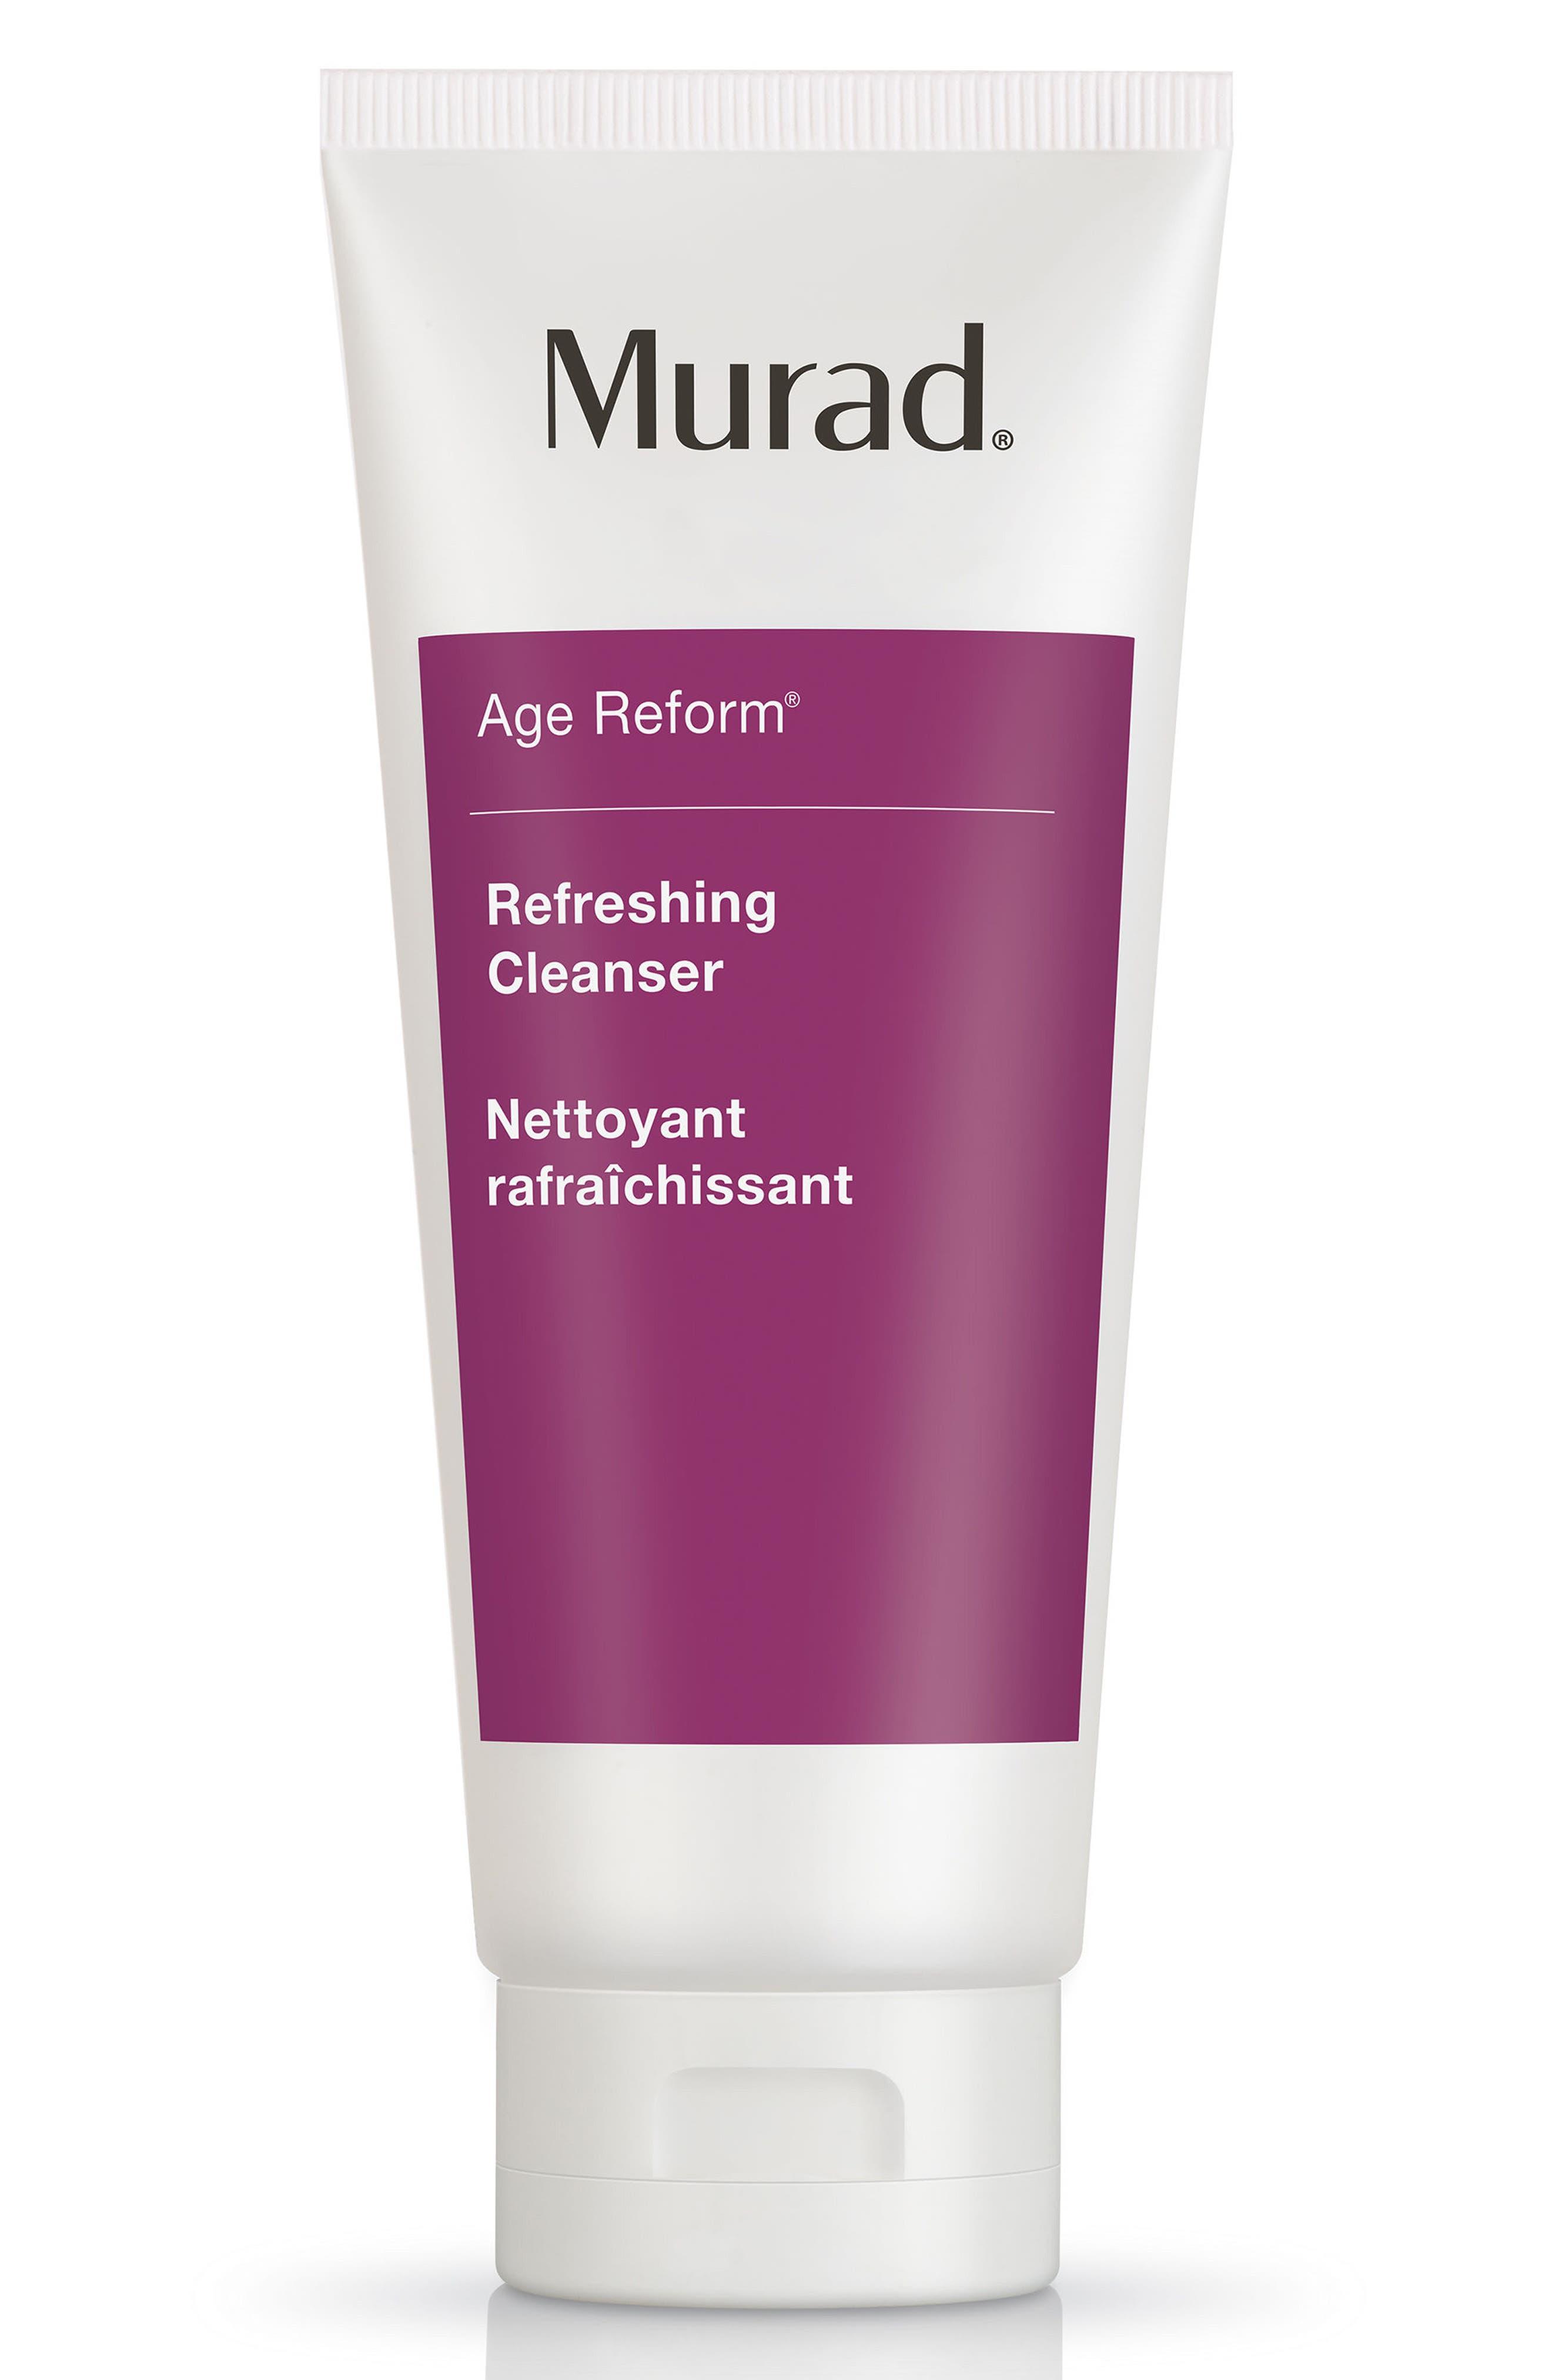 Murad® Refreshing Cleanser